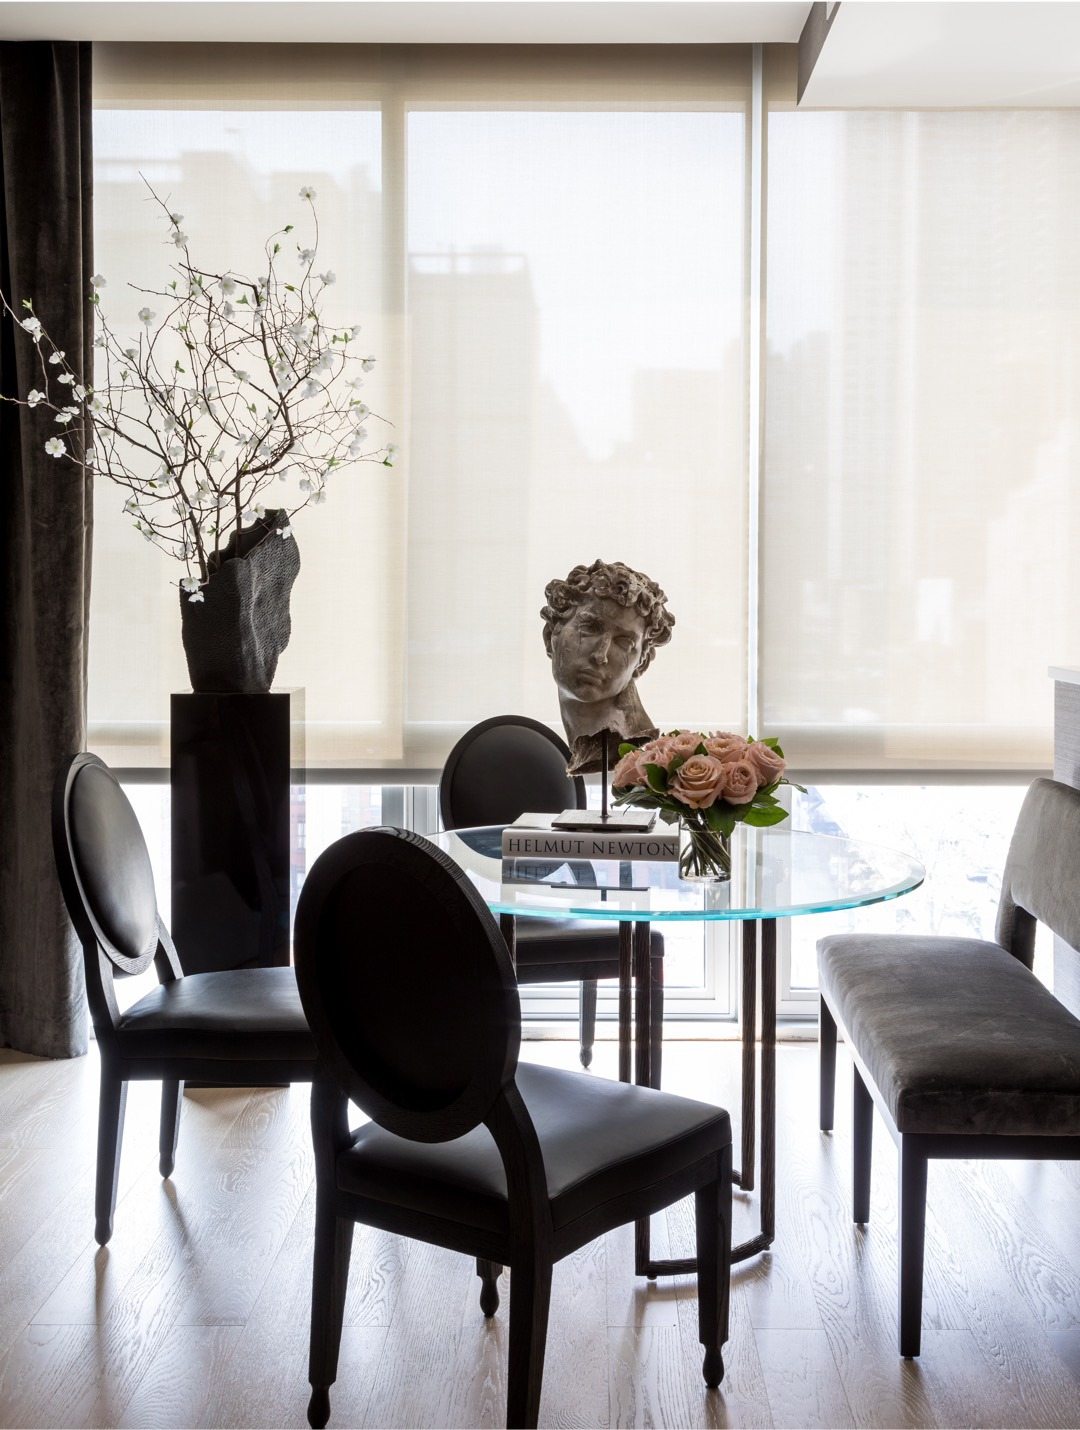 Top Interior Designers: Ryan Korban